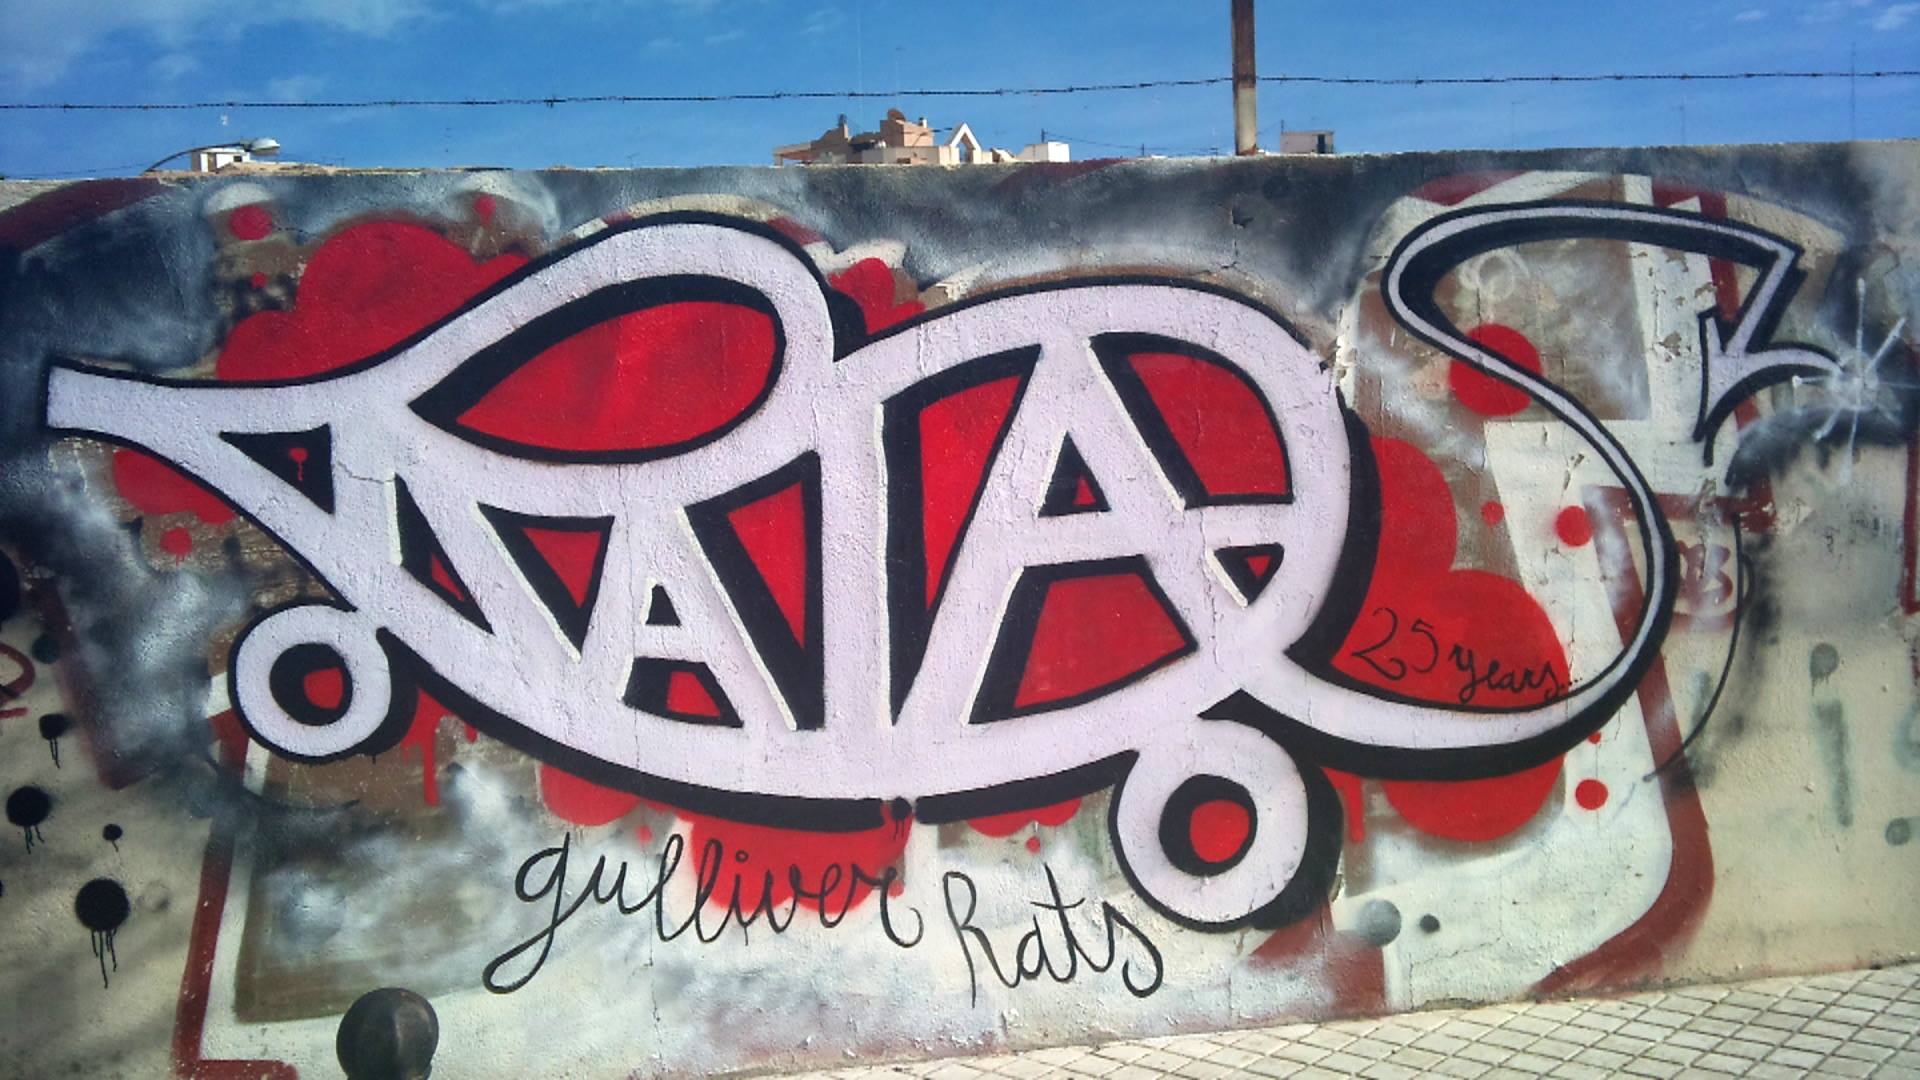 Fotos de graffitis de skate olvin abarca graffiti gulliver rats cuervo sex and skate urban altavistaventures Images